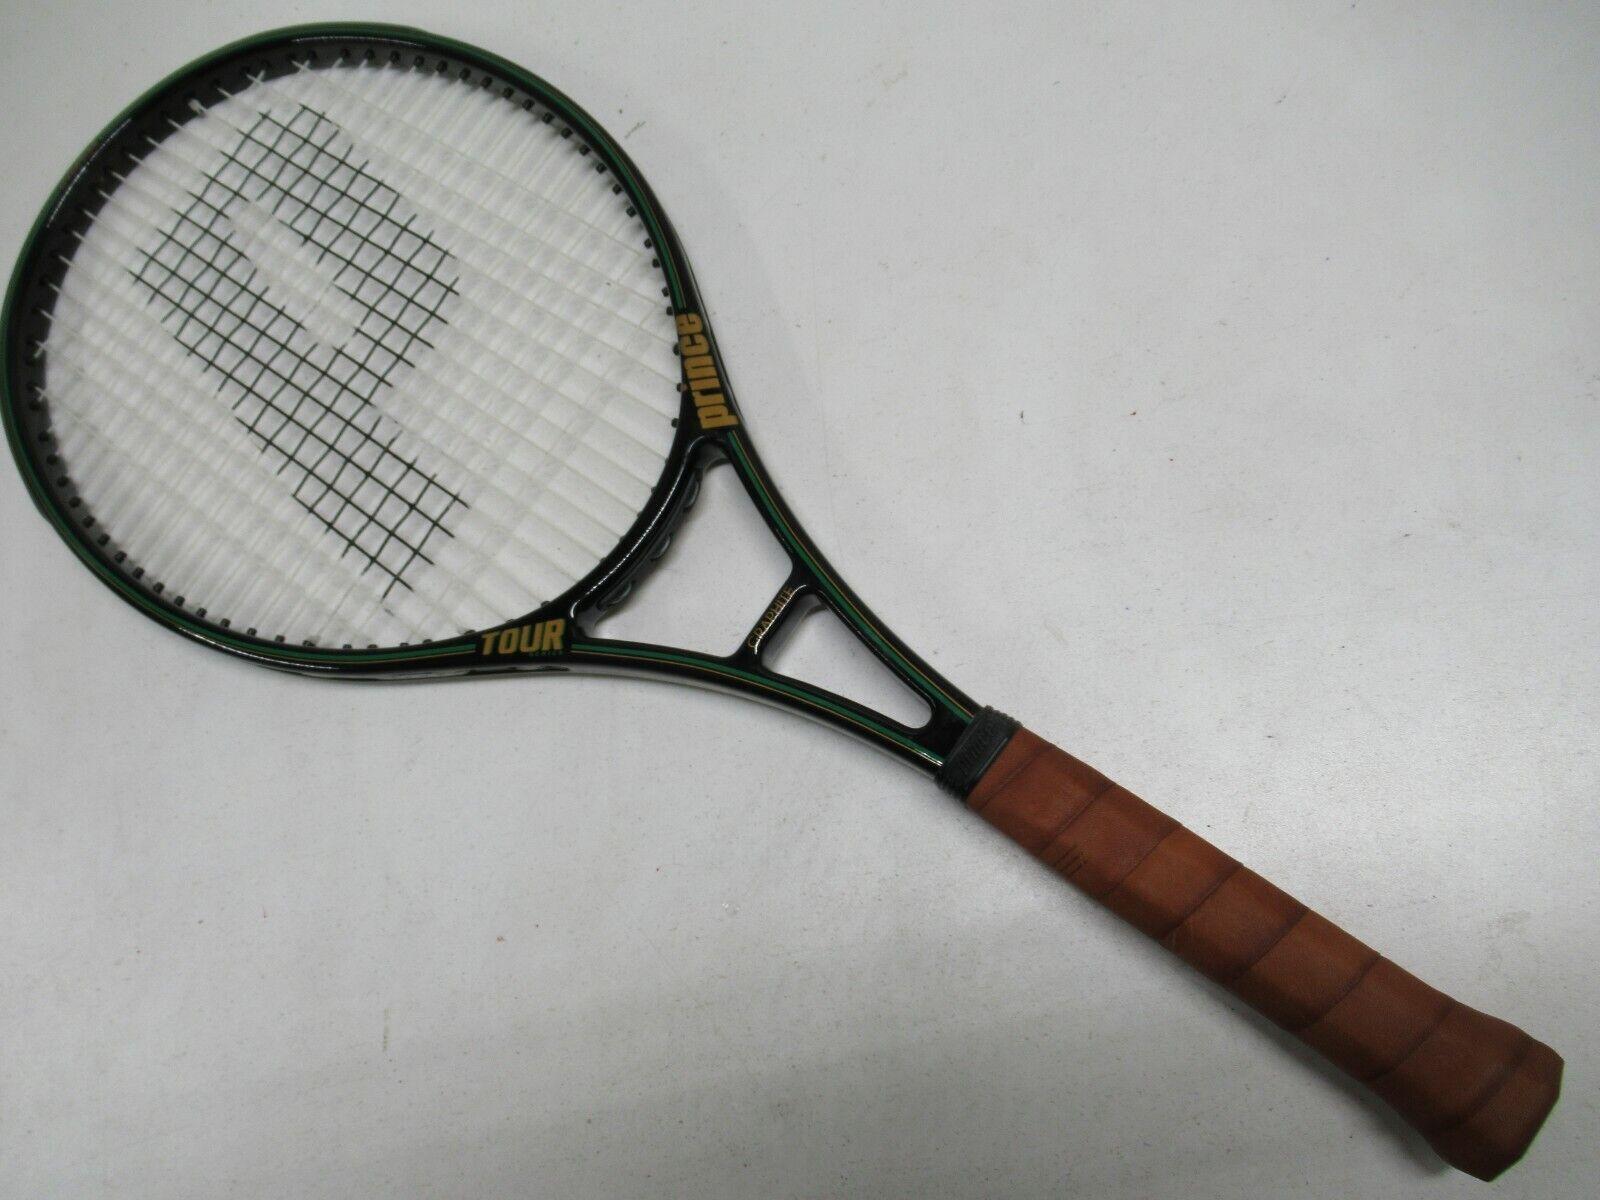 Prince Clásico Grafito 107  tour  tenis raqueta (4 3 8) Distribuidor Demo de menta